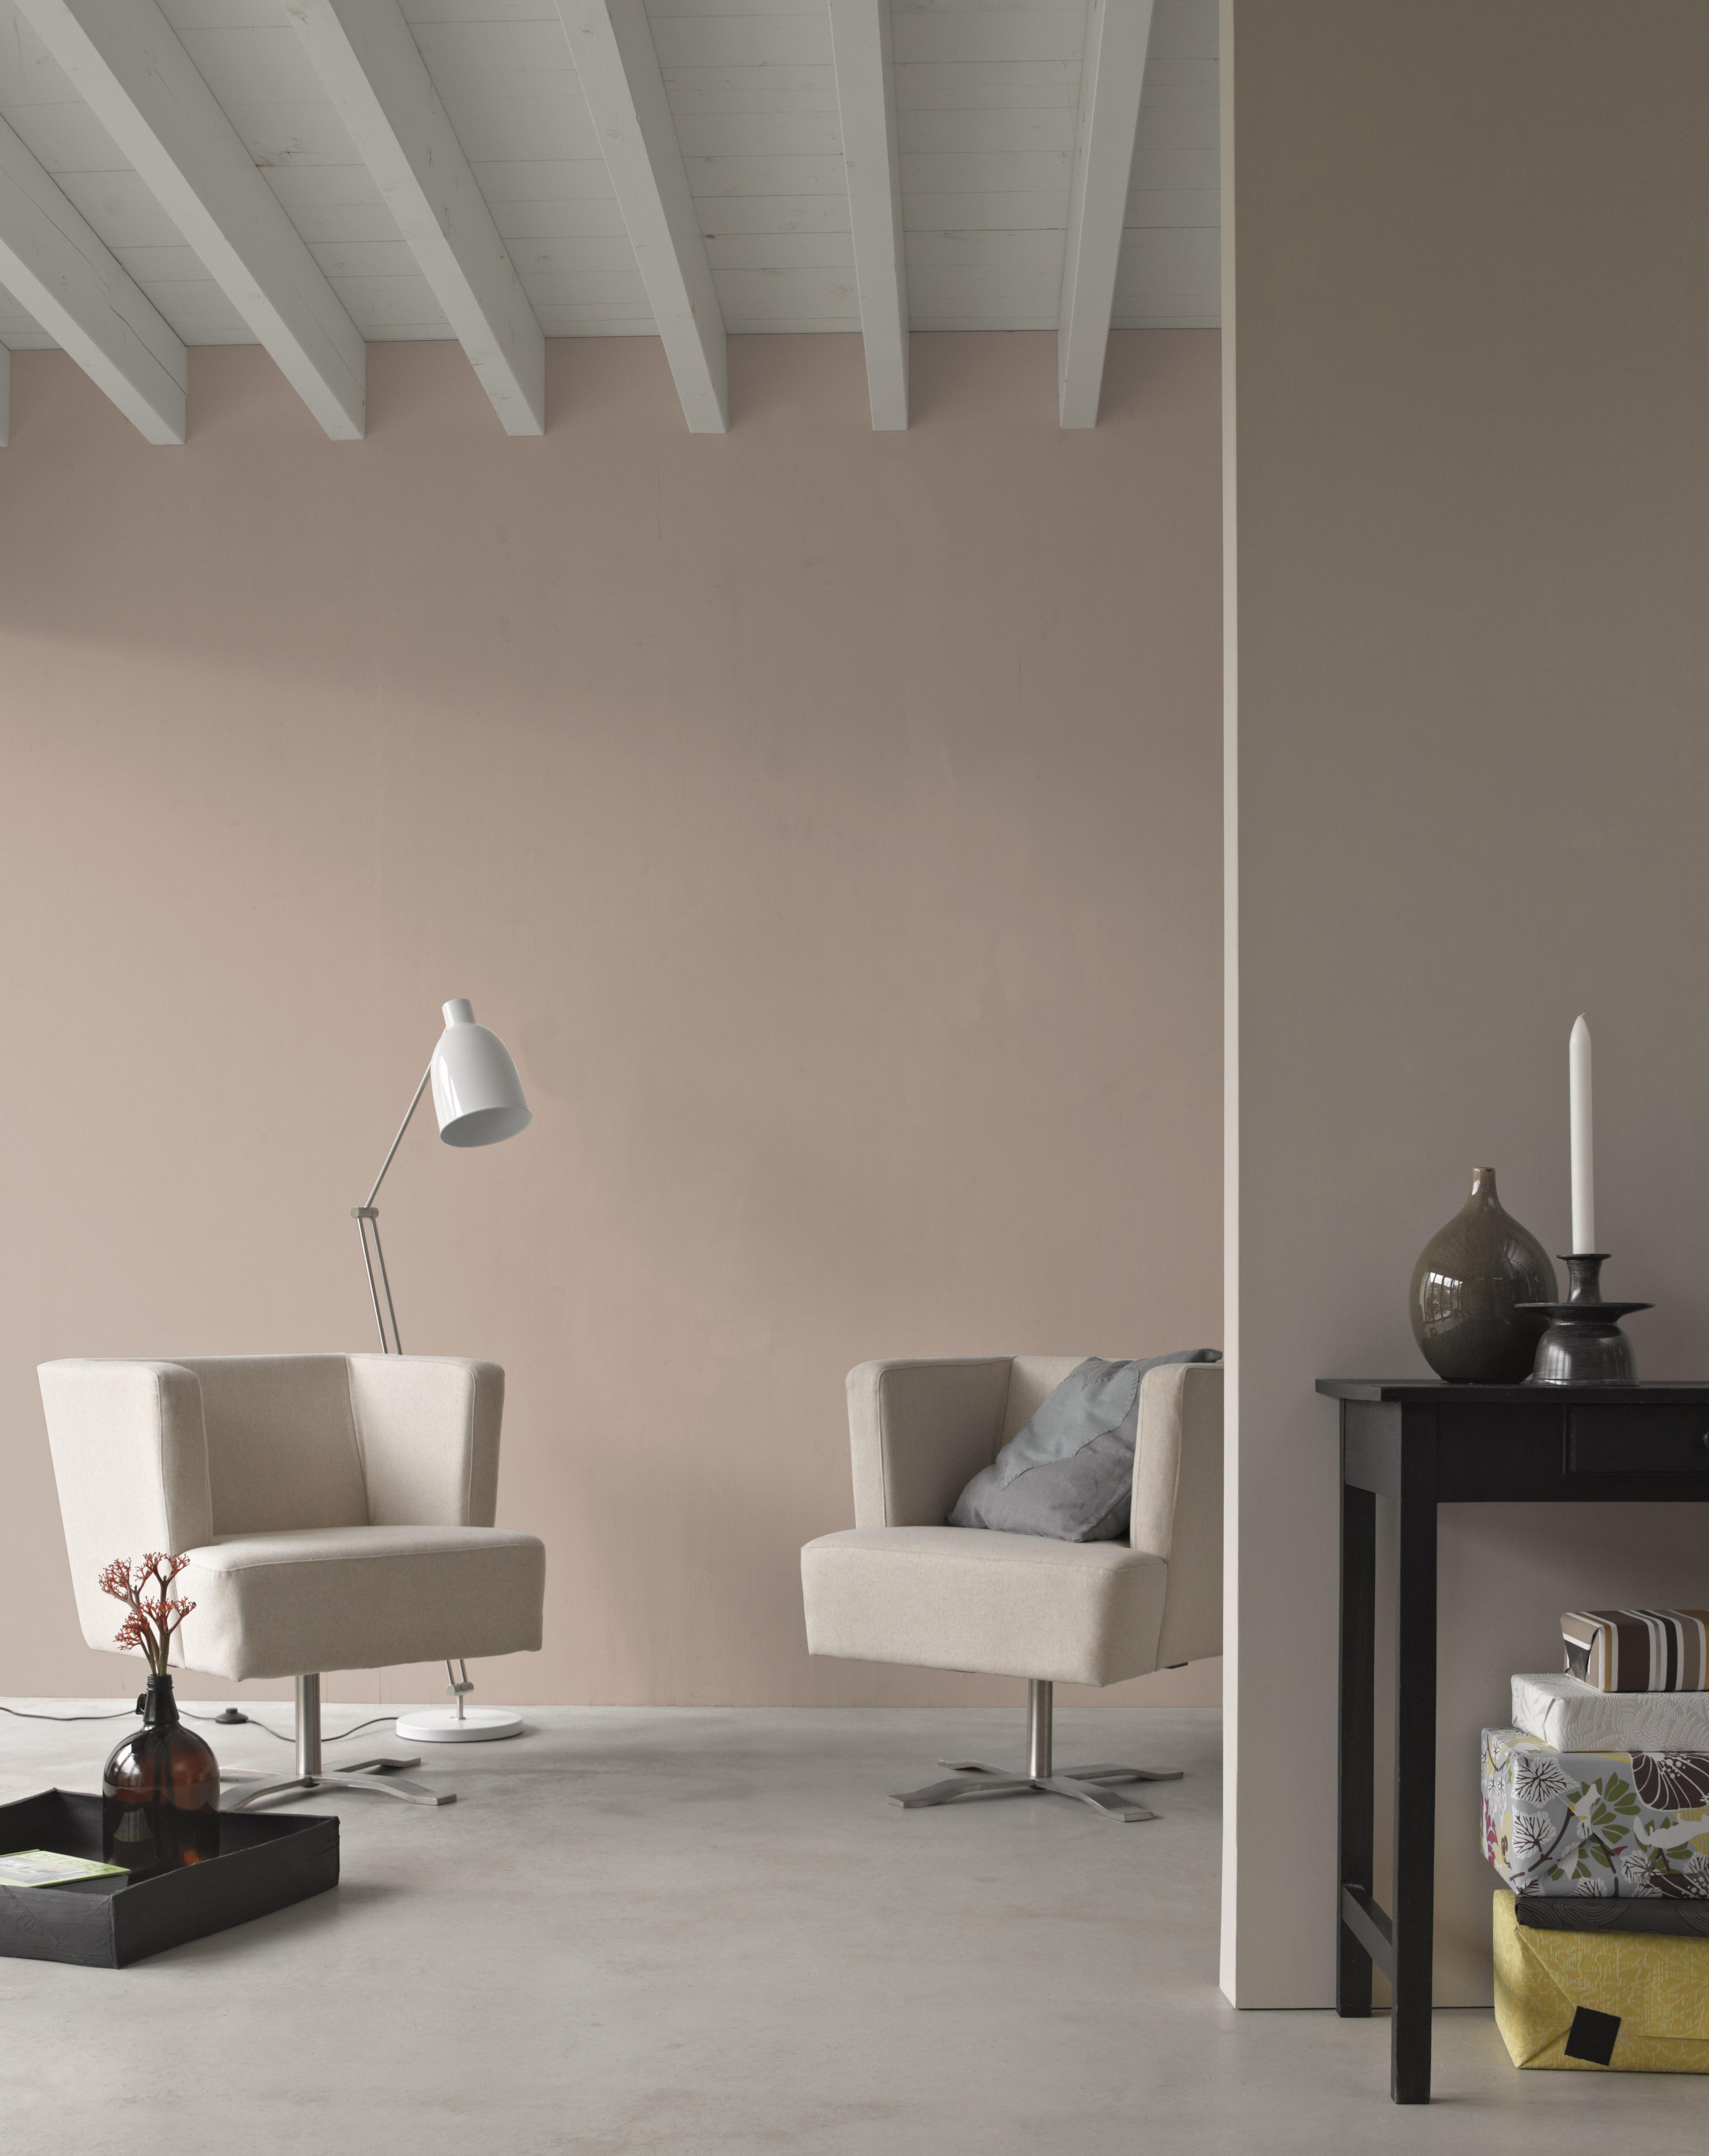 81029 - Smooth wall -